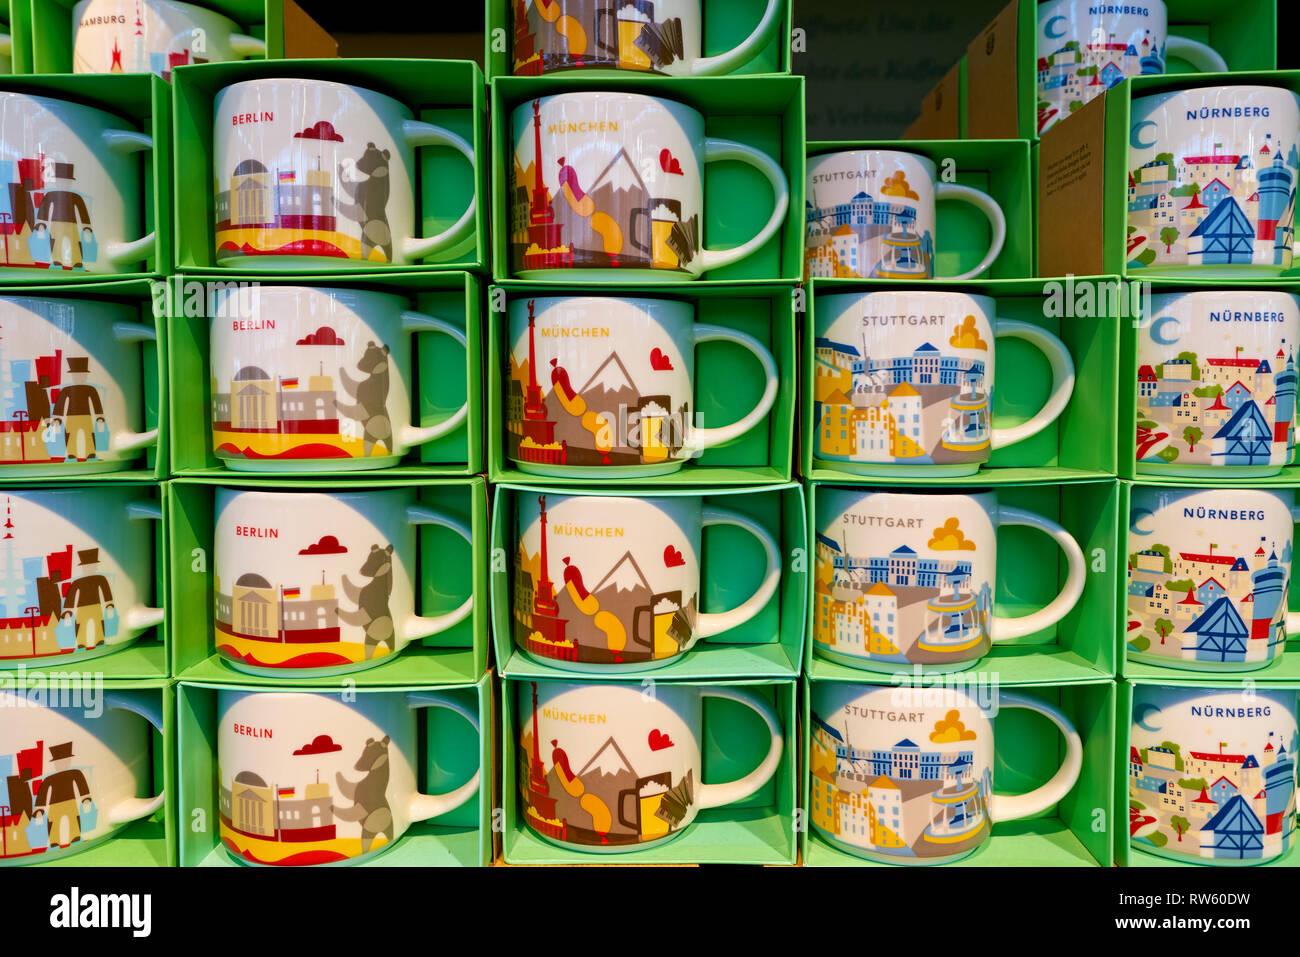 Dusseldorf Germany Circa October 2018 Mugs On Display At Starbucks Coffee Shop In Dusseldorf Stock Photo Alamy